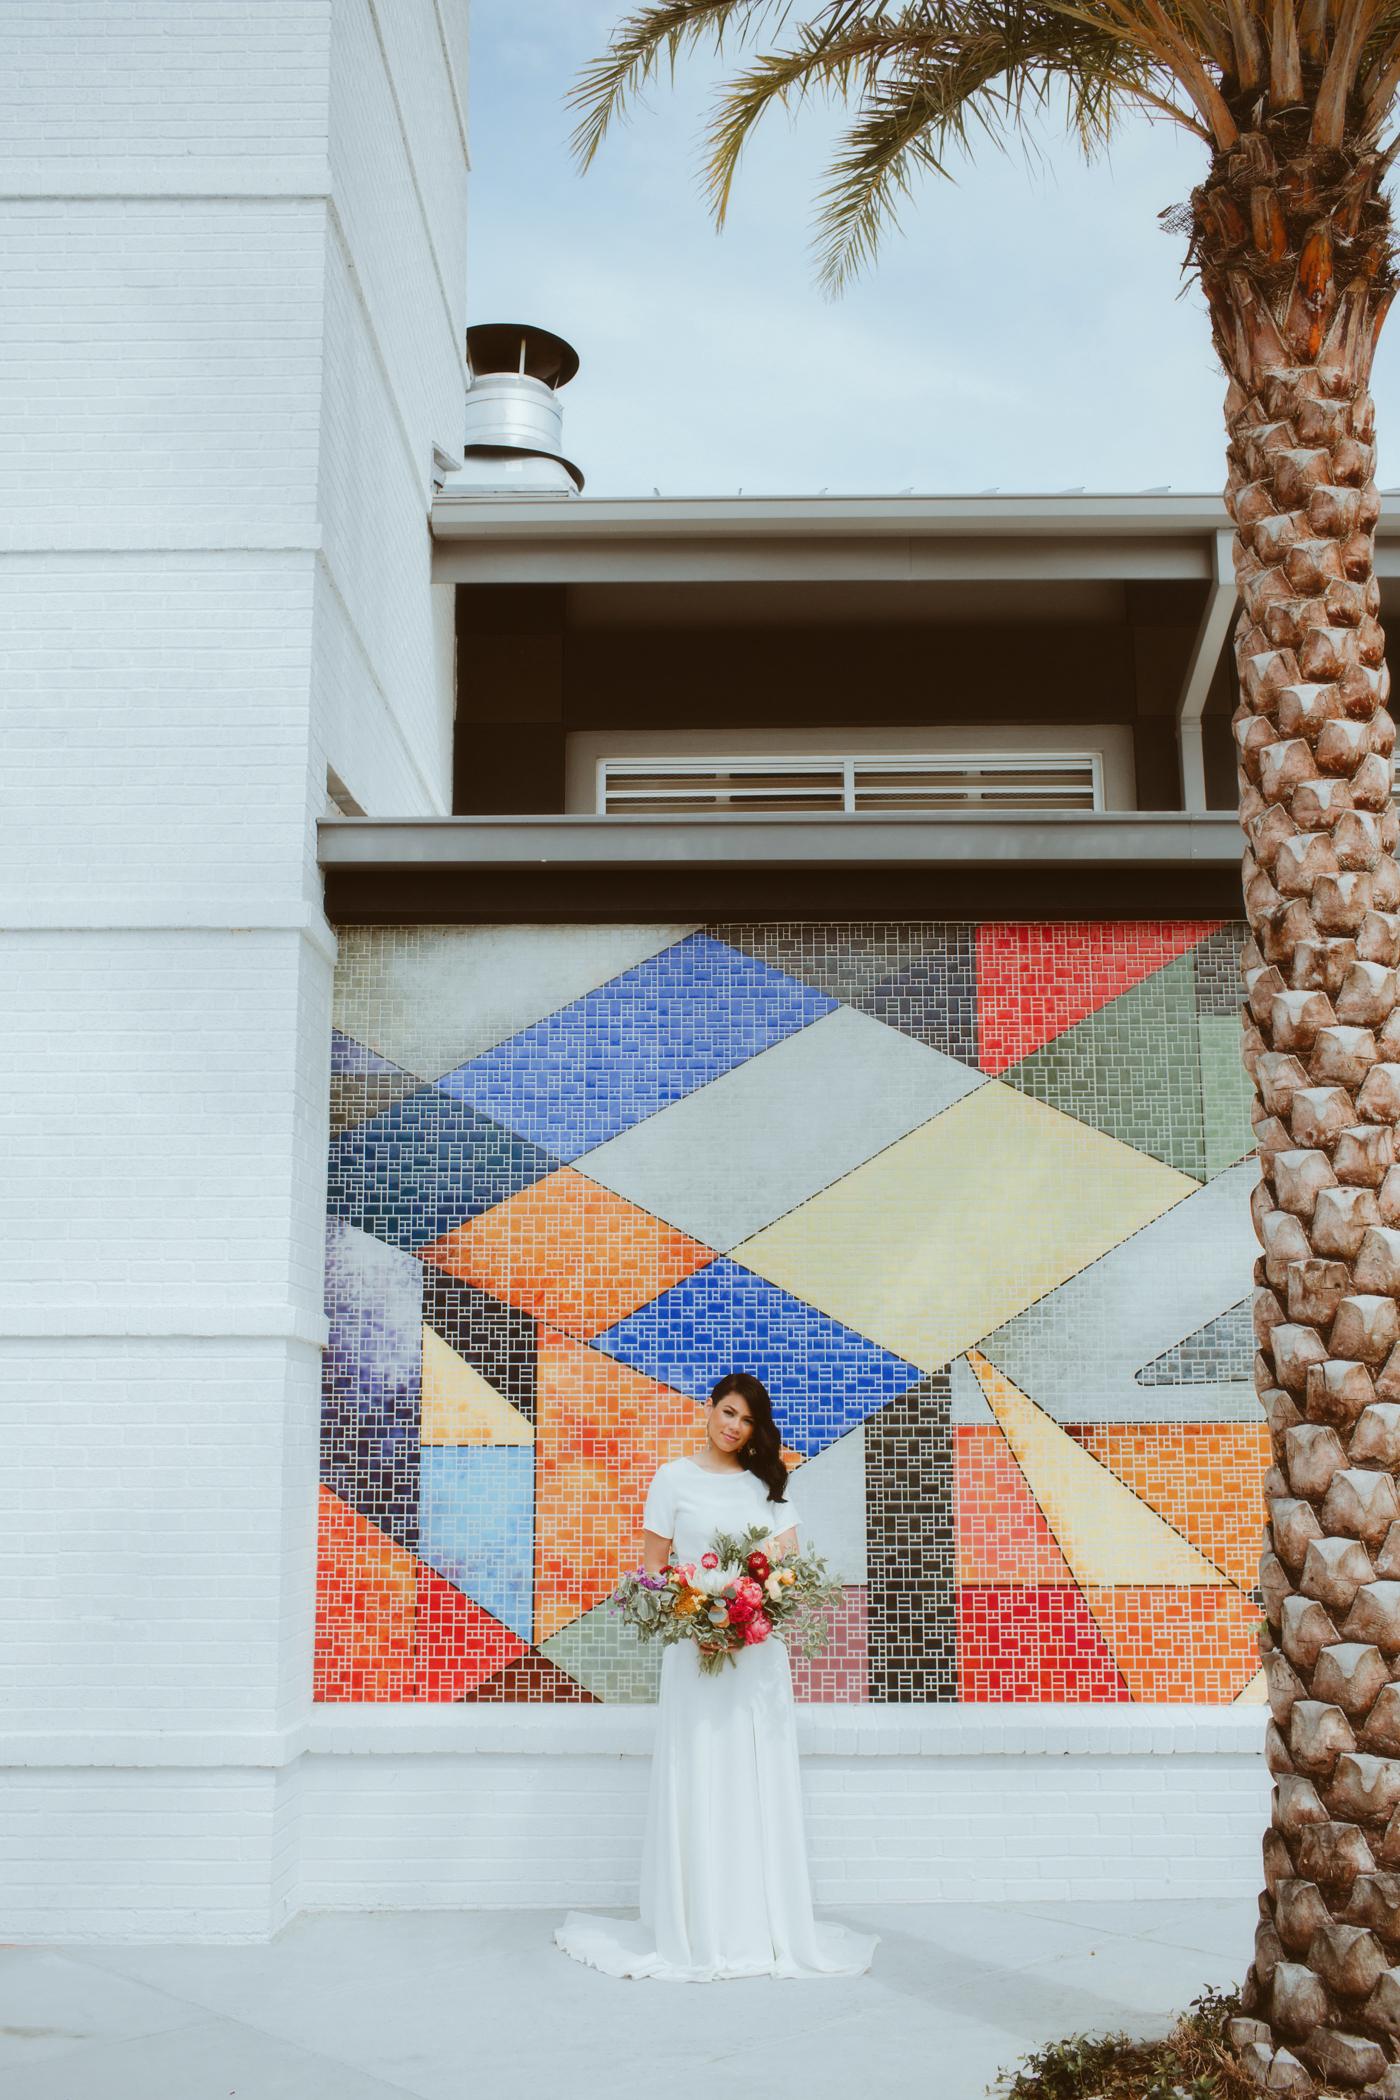 Wedding | Canvas Market | Lake Nona-Orlando, FL  | Vanessa Boy Photography | vanessaboy.com-243.com |Green Wedding Shoes.jpg